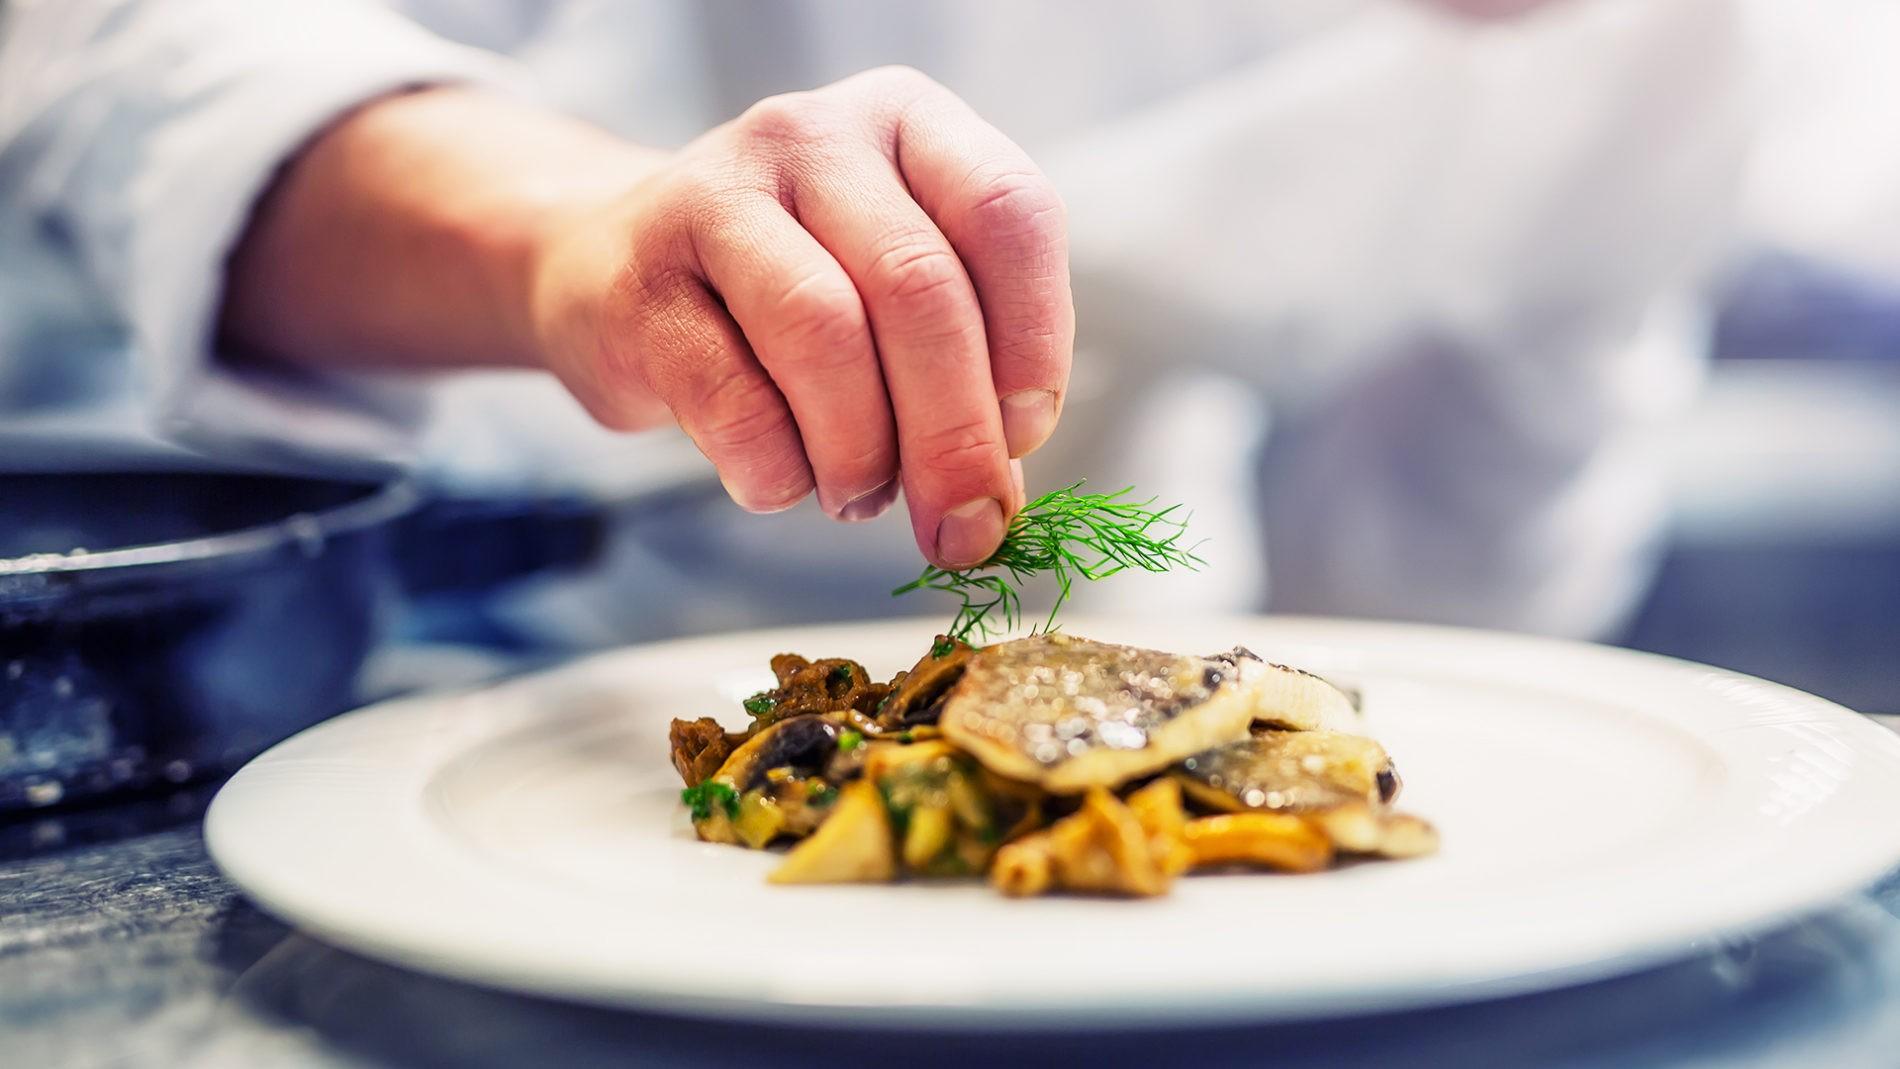 частен готвач във твойя дом